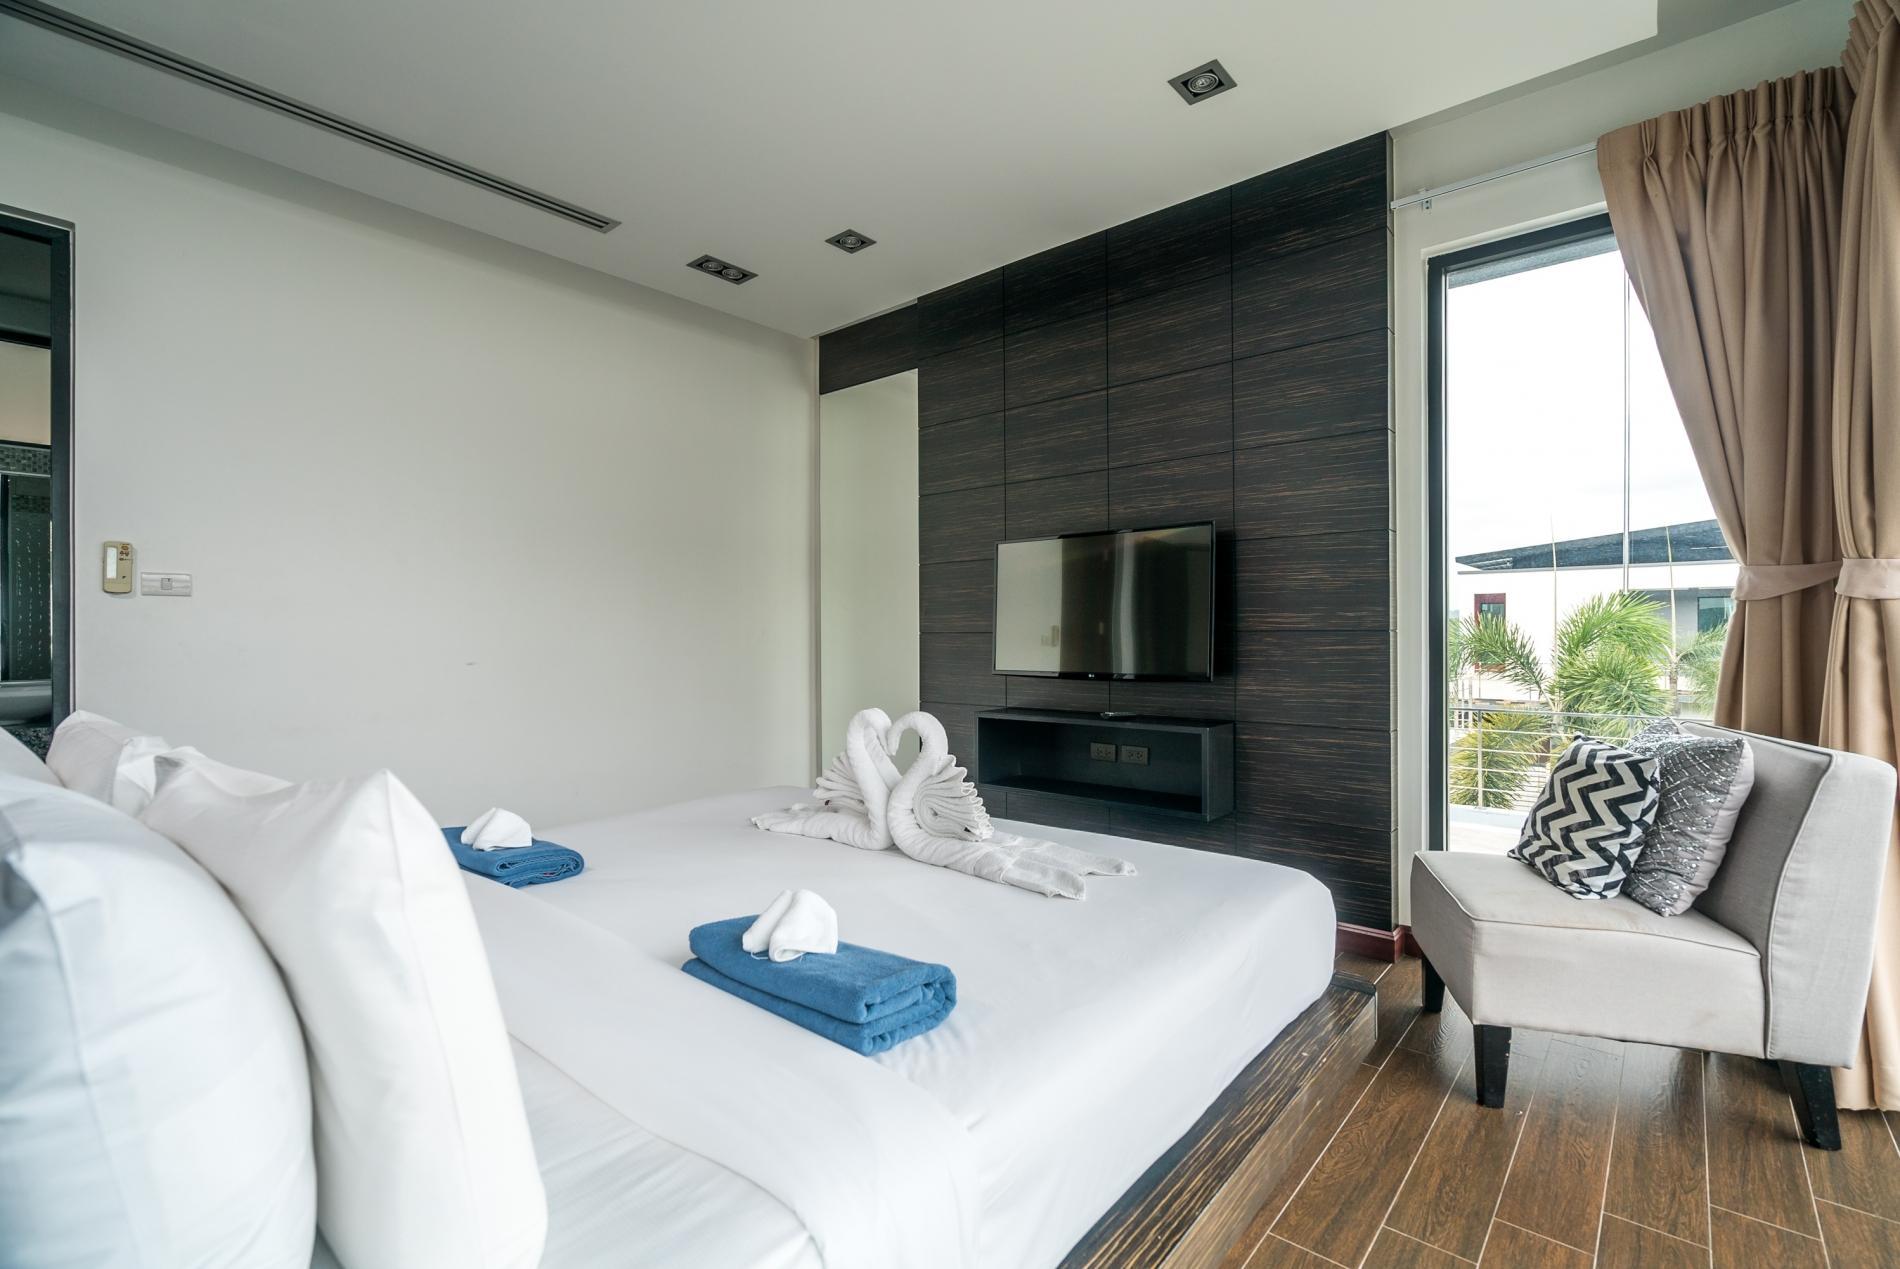 Apartment Diamond 272 - Modern 4 br private pool and garden villa photo 20257913